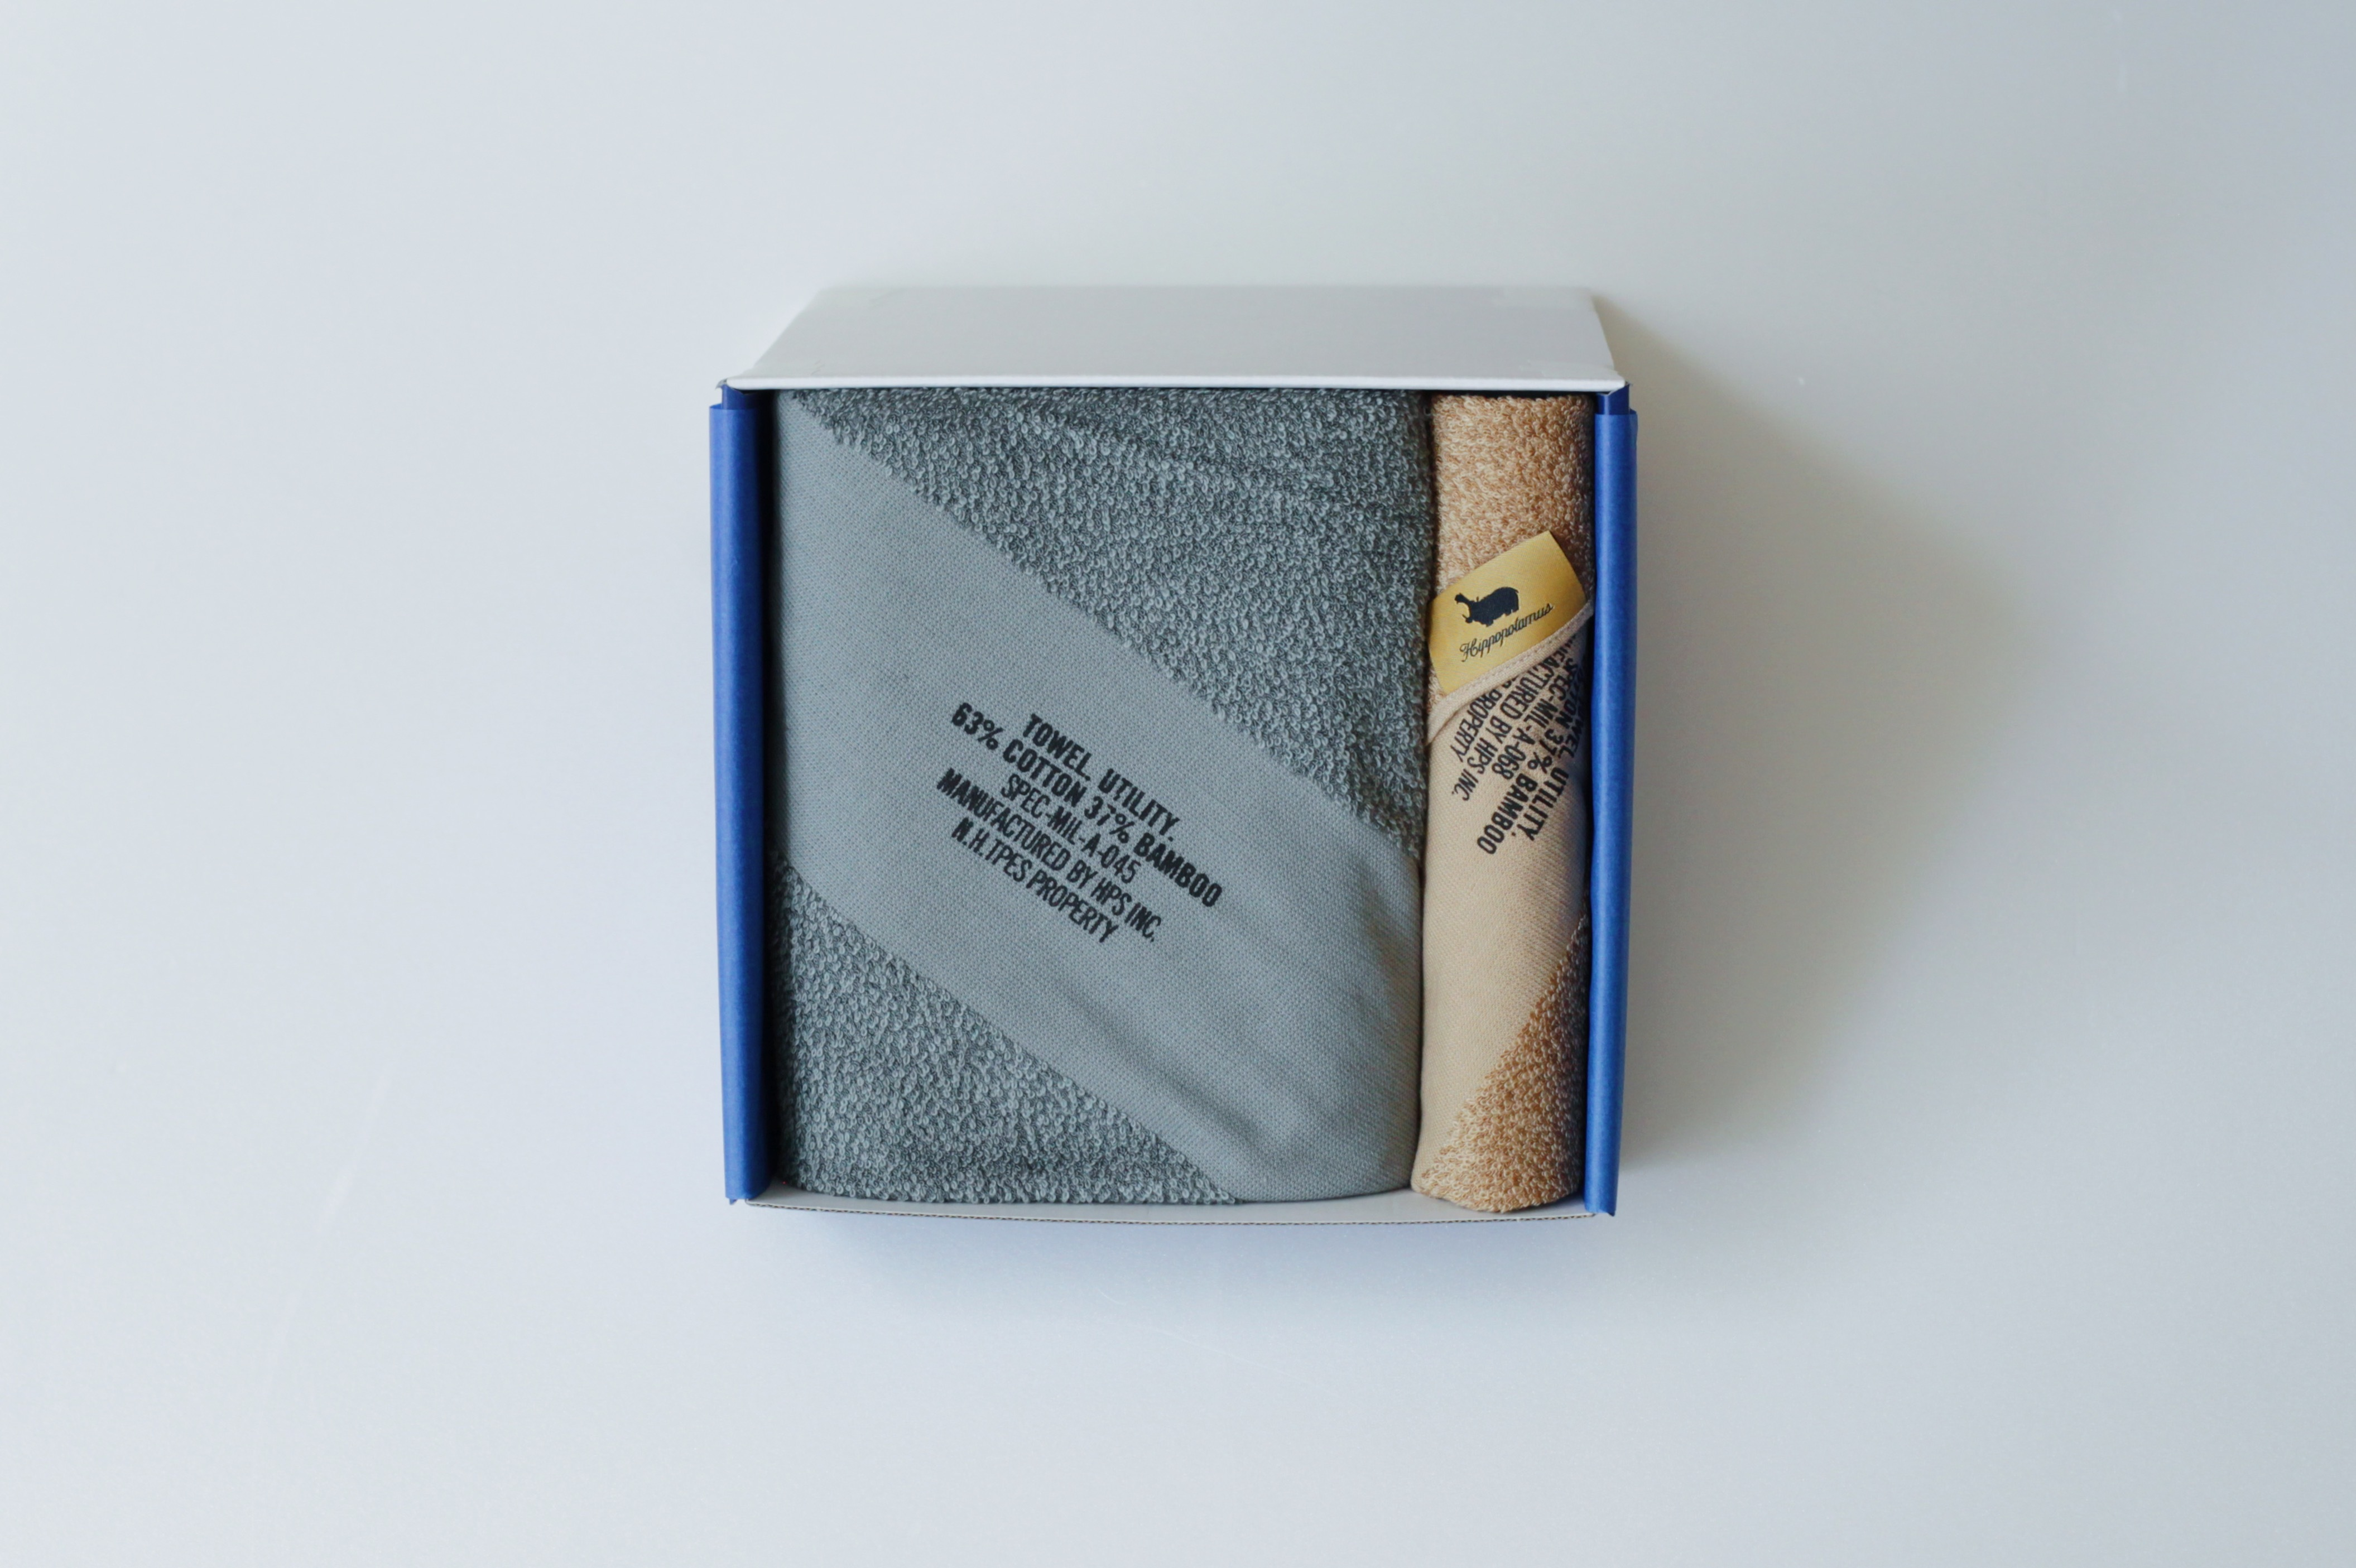 【N.HOOLYWOOD(エヌハリウッド)×Hippopotamus(ヒポポタマス)】 ギフトセット フェイスタオル×1+チーフタオル×1